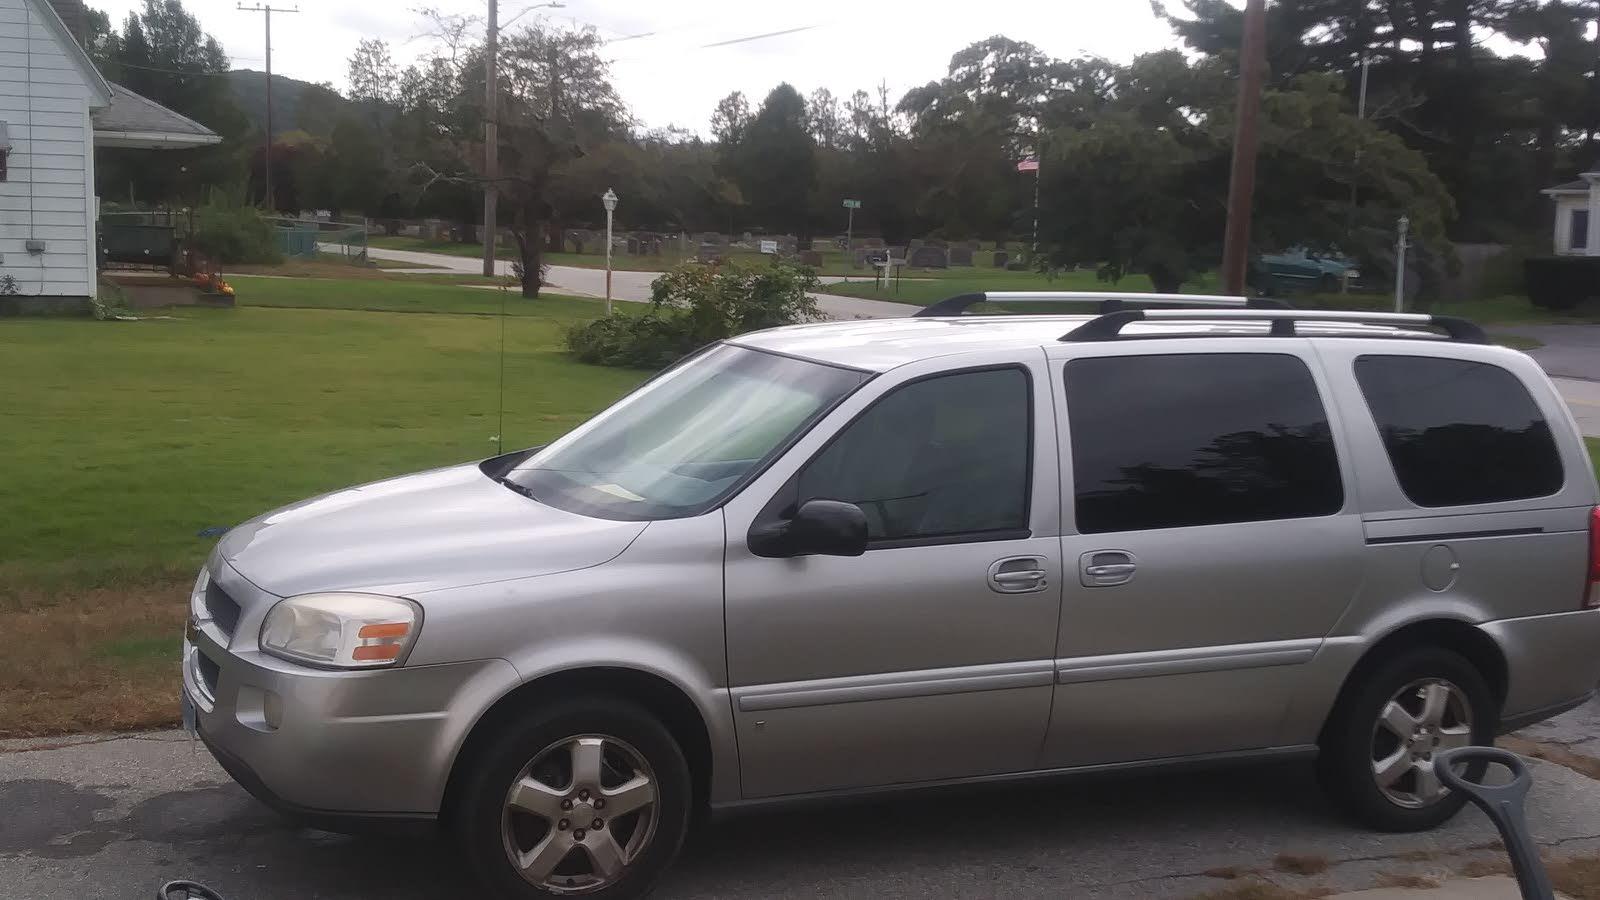 Chevrolet Uplander Questions - Remove Seats Of Chevy Uplander 2007